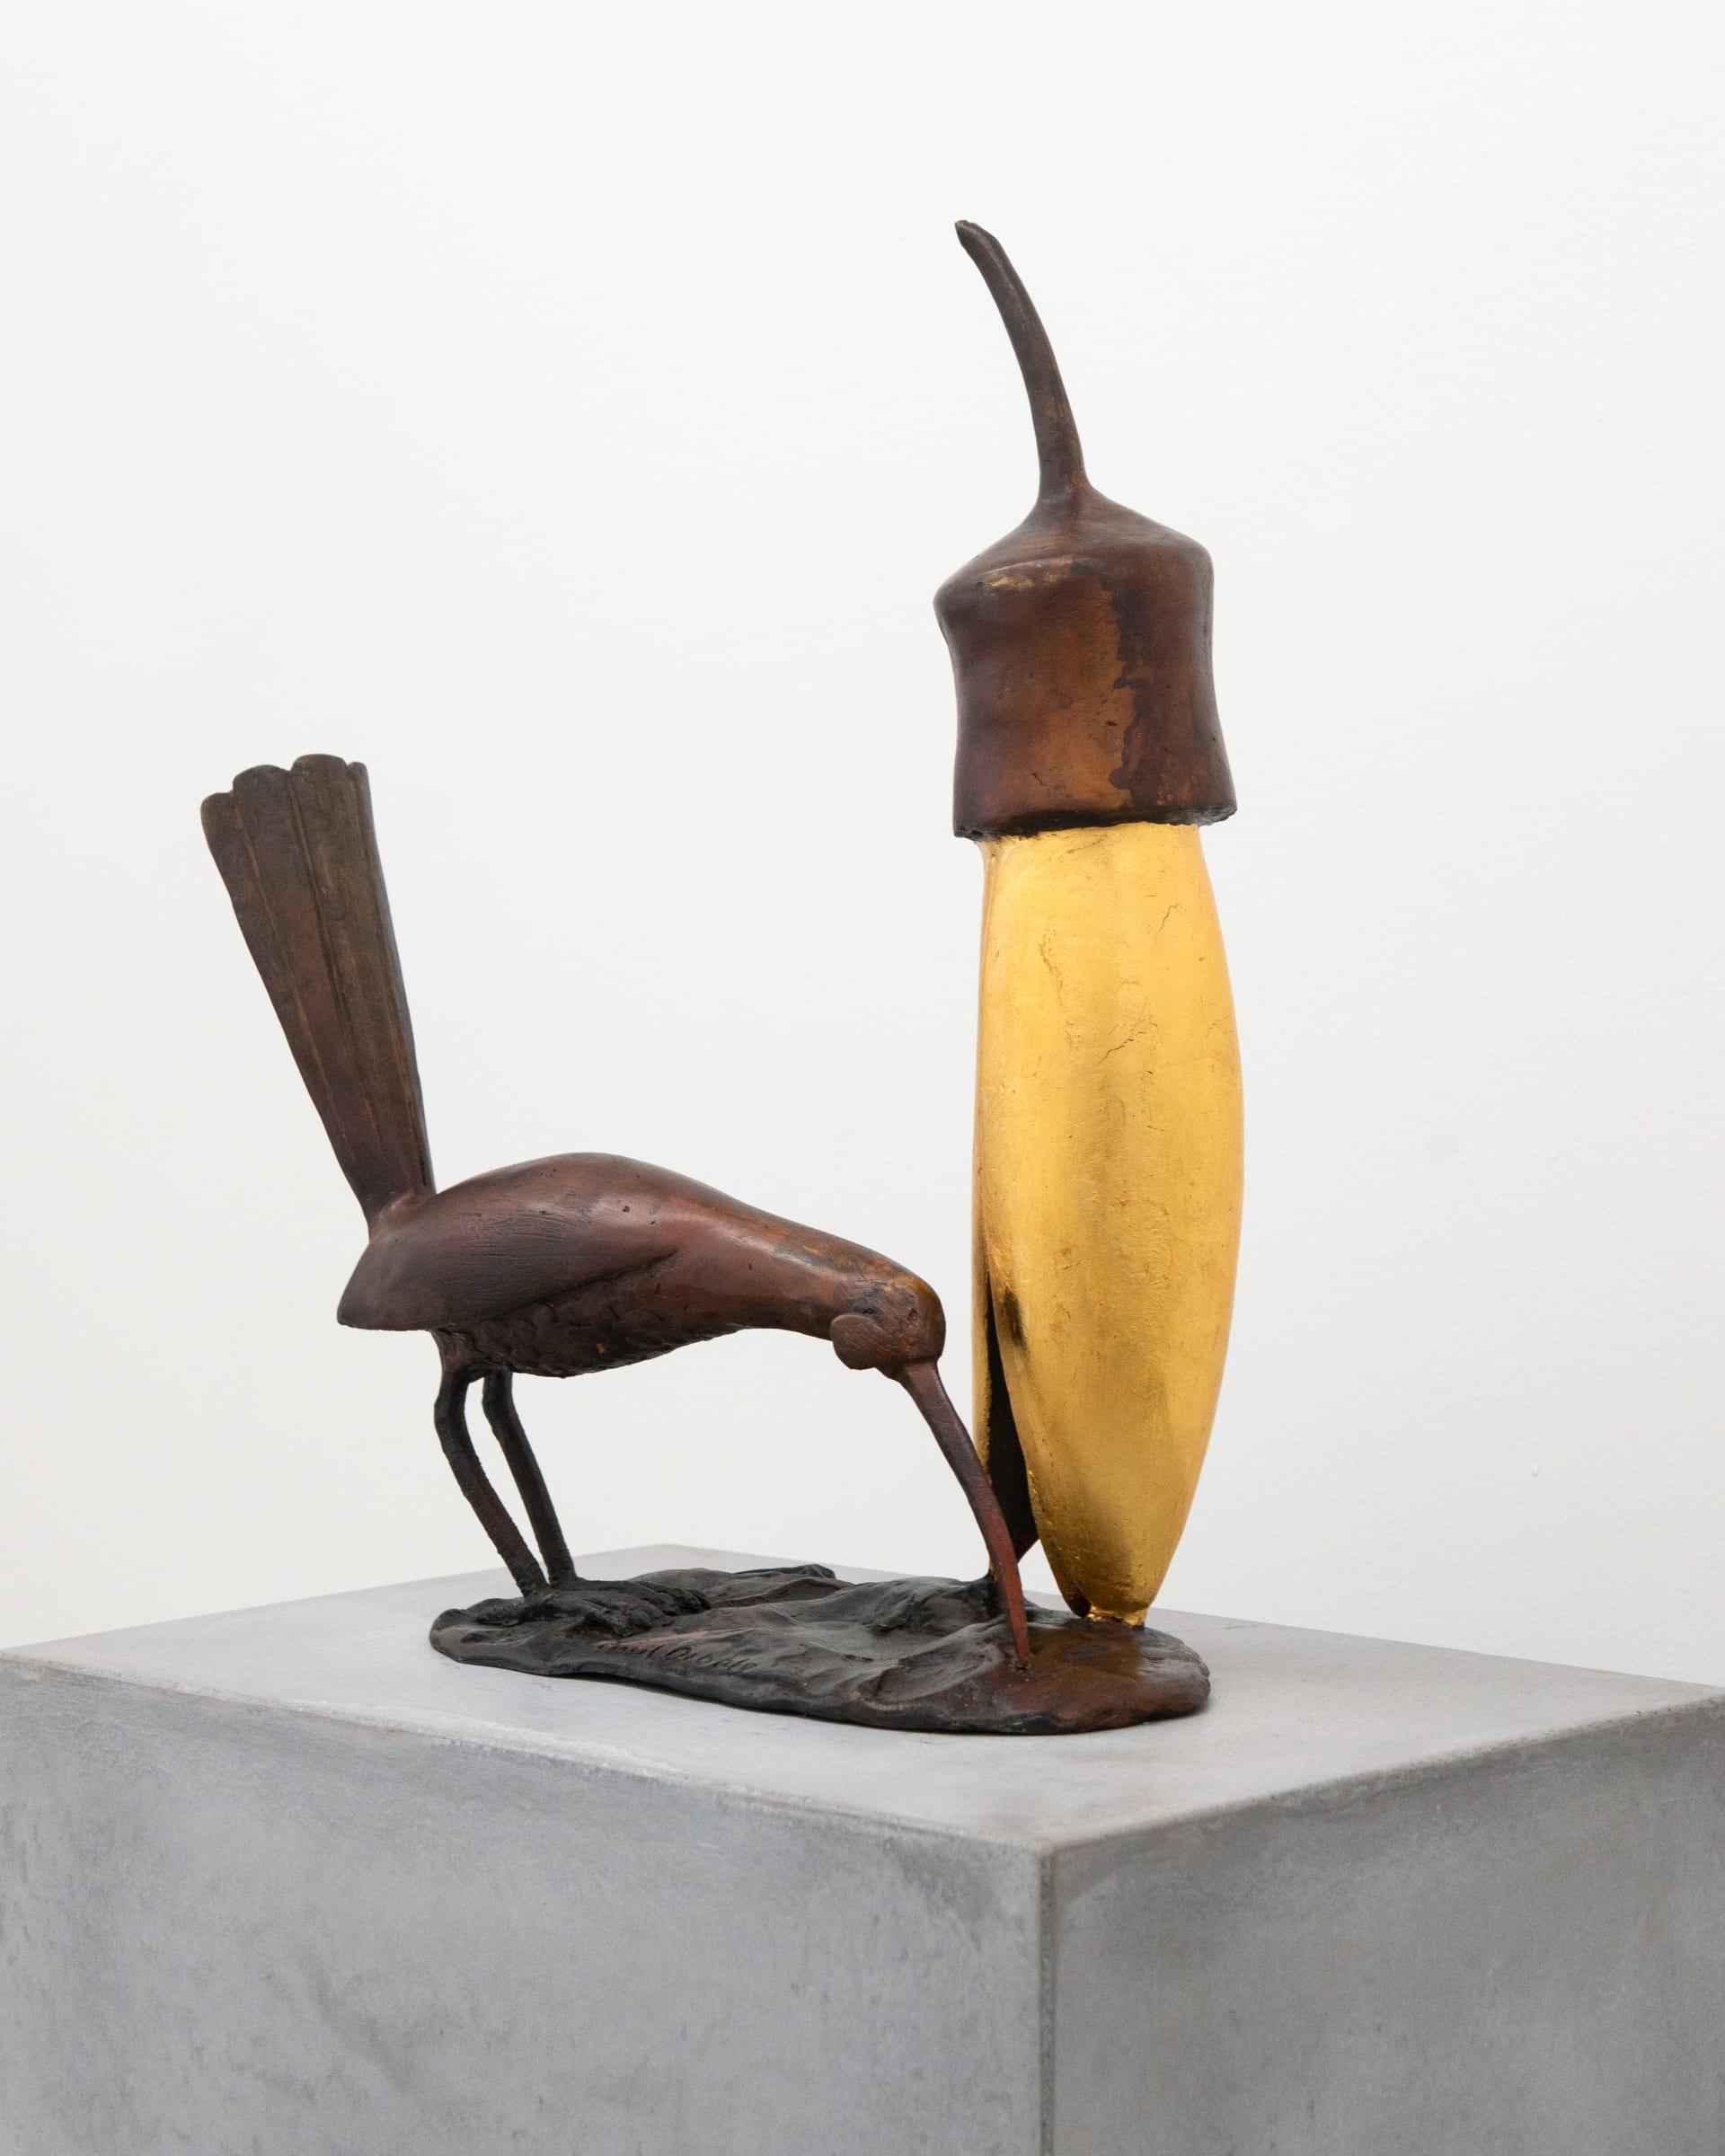 "<span class=""link fancybox-details-link""><a href=""/artists/50-paul-dibble/works/8492-paul-dibble-bird-and-kowhai-2020/"">View Detail Page</a></span><div class=""artist""><strong>Paul DIBBLE</strong></div> <div class=""title""><em>Bird and Kowhai</em>, 2020</div> <div class=""signed_and_dated"">signed on base</div> <div class=""medium"">Cast bronze and 24 carat gold</div> <div class=""dimensions"">500mm x 400mm x 150mm </div> <div class=""edition_details"">Edition of 10</div><div class=""copyright_line"">Copyright The Artist</div>"